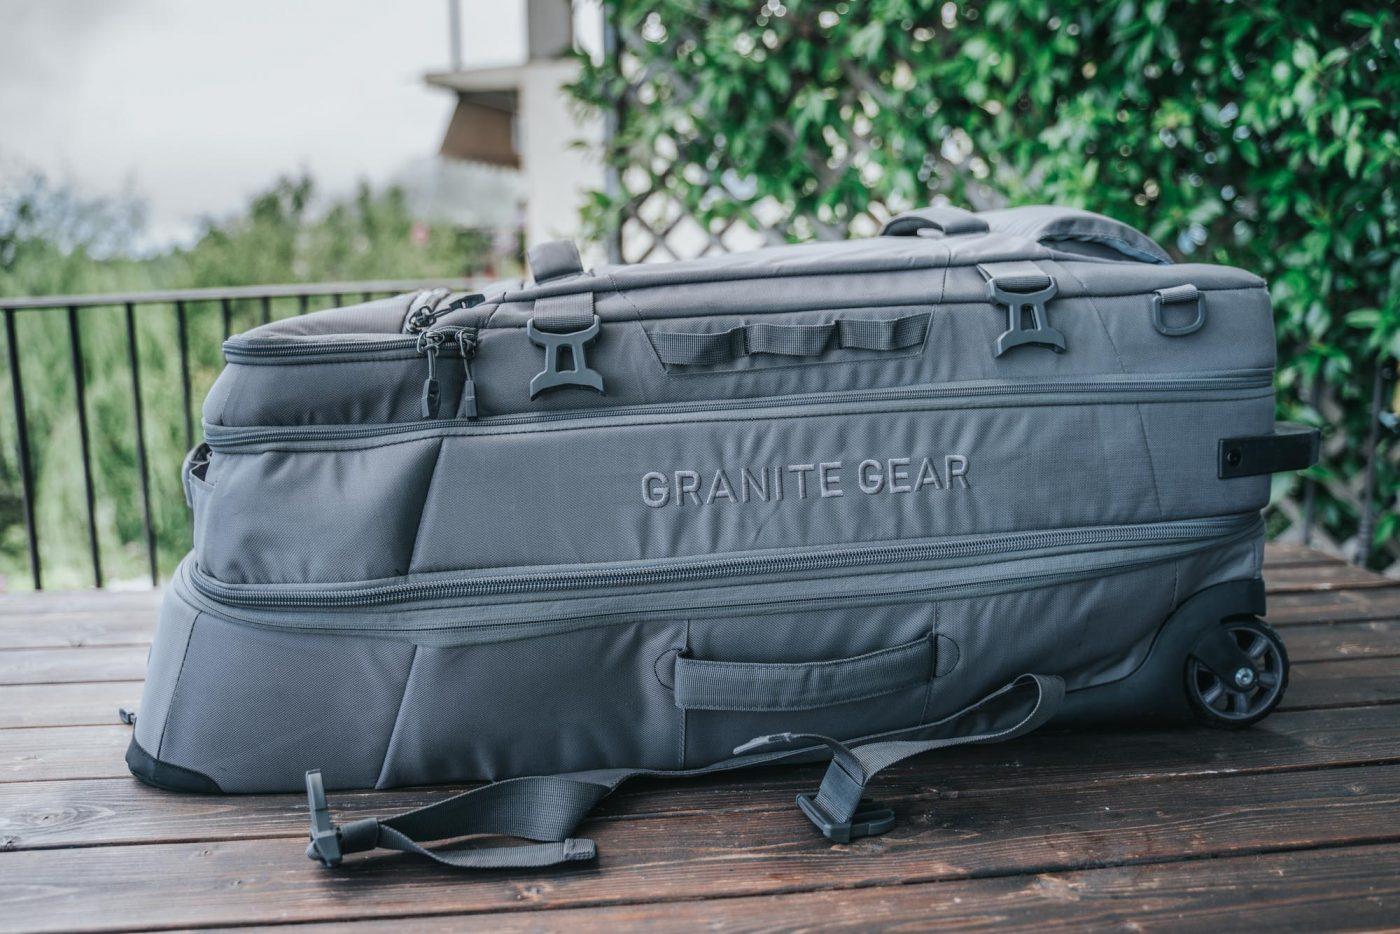 eco friendly gift: Granite Gear bag